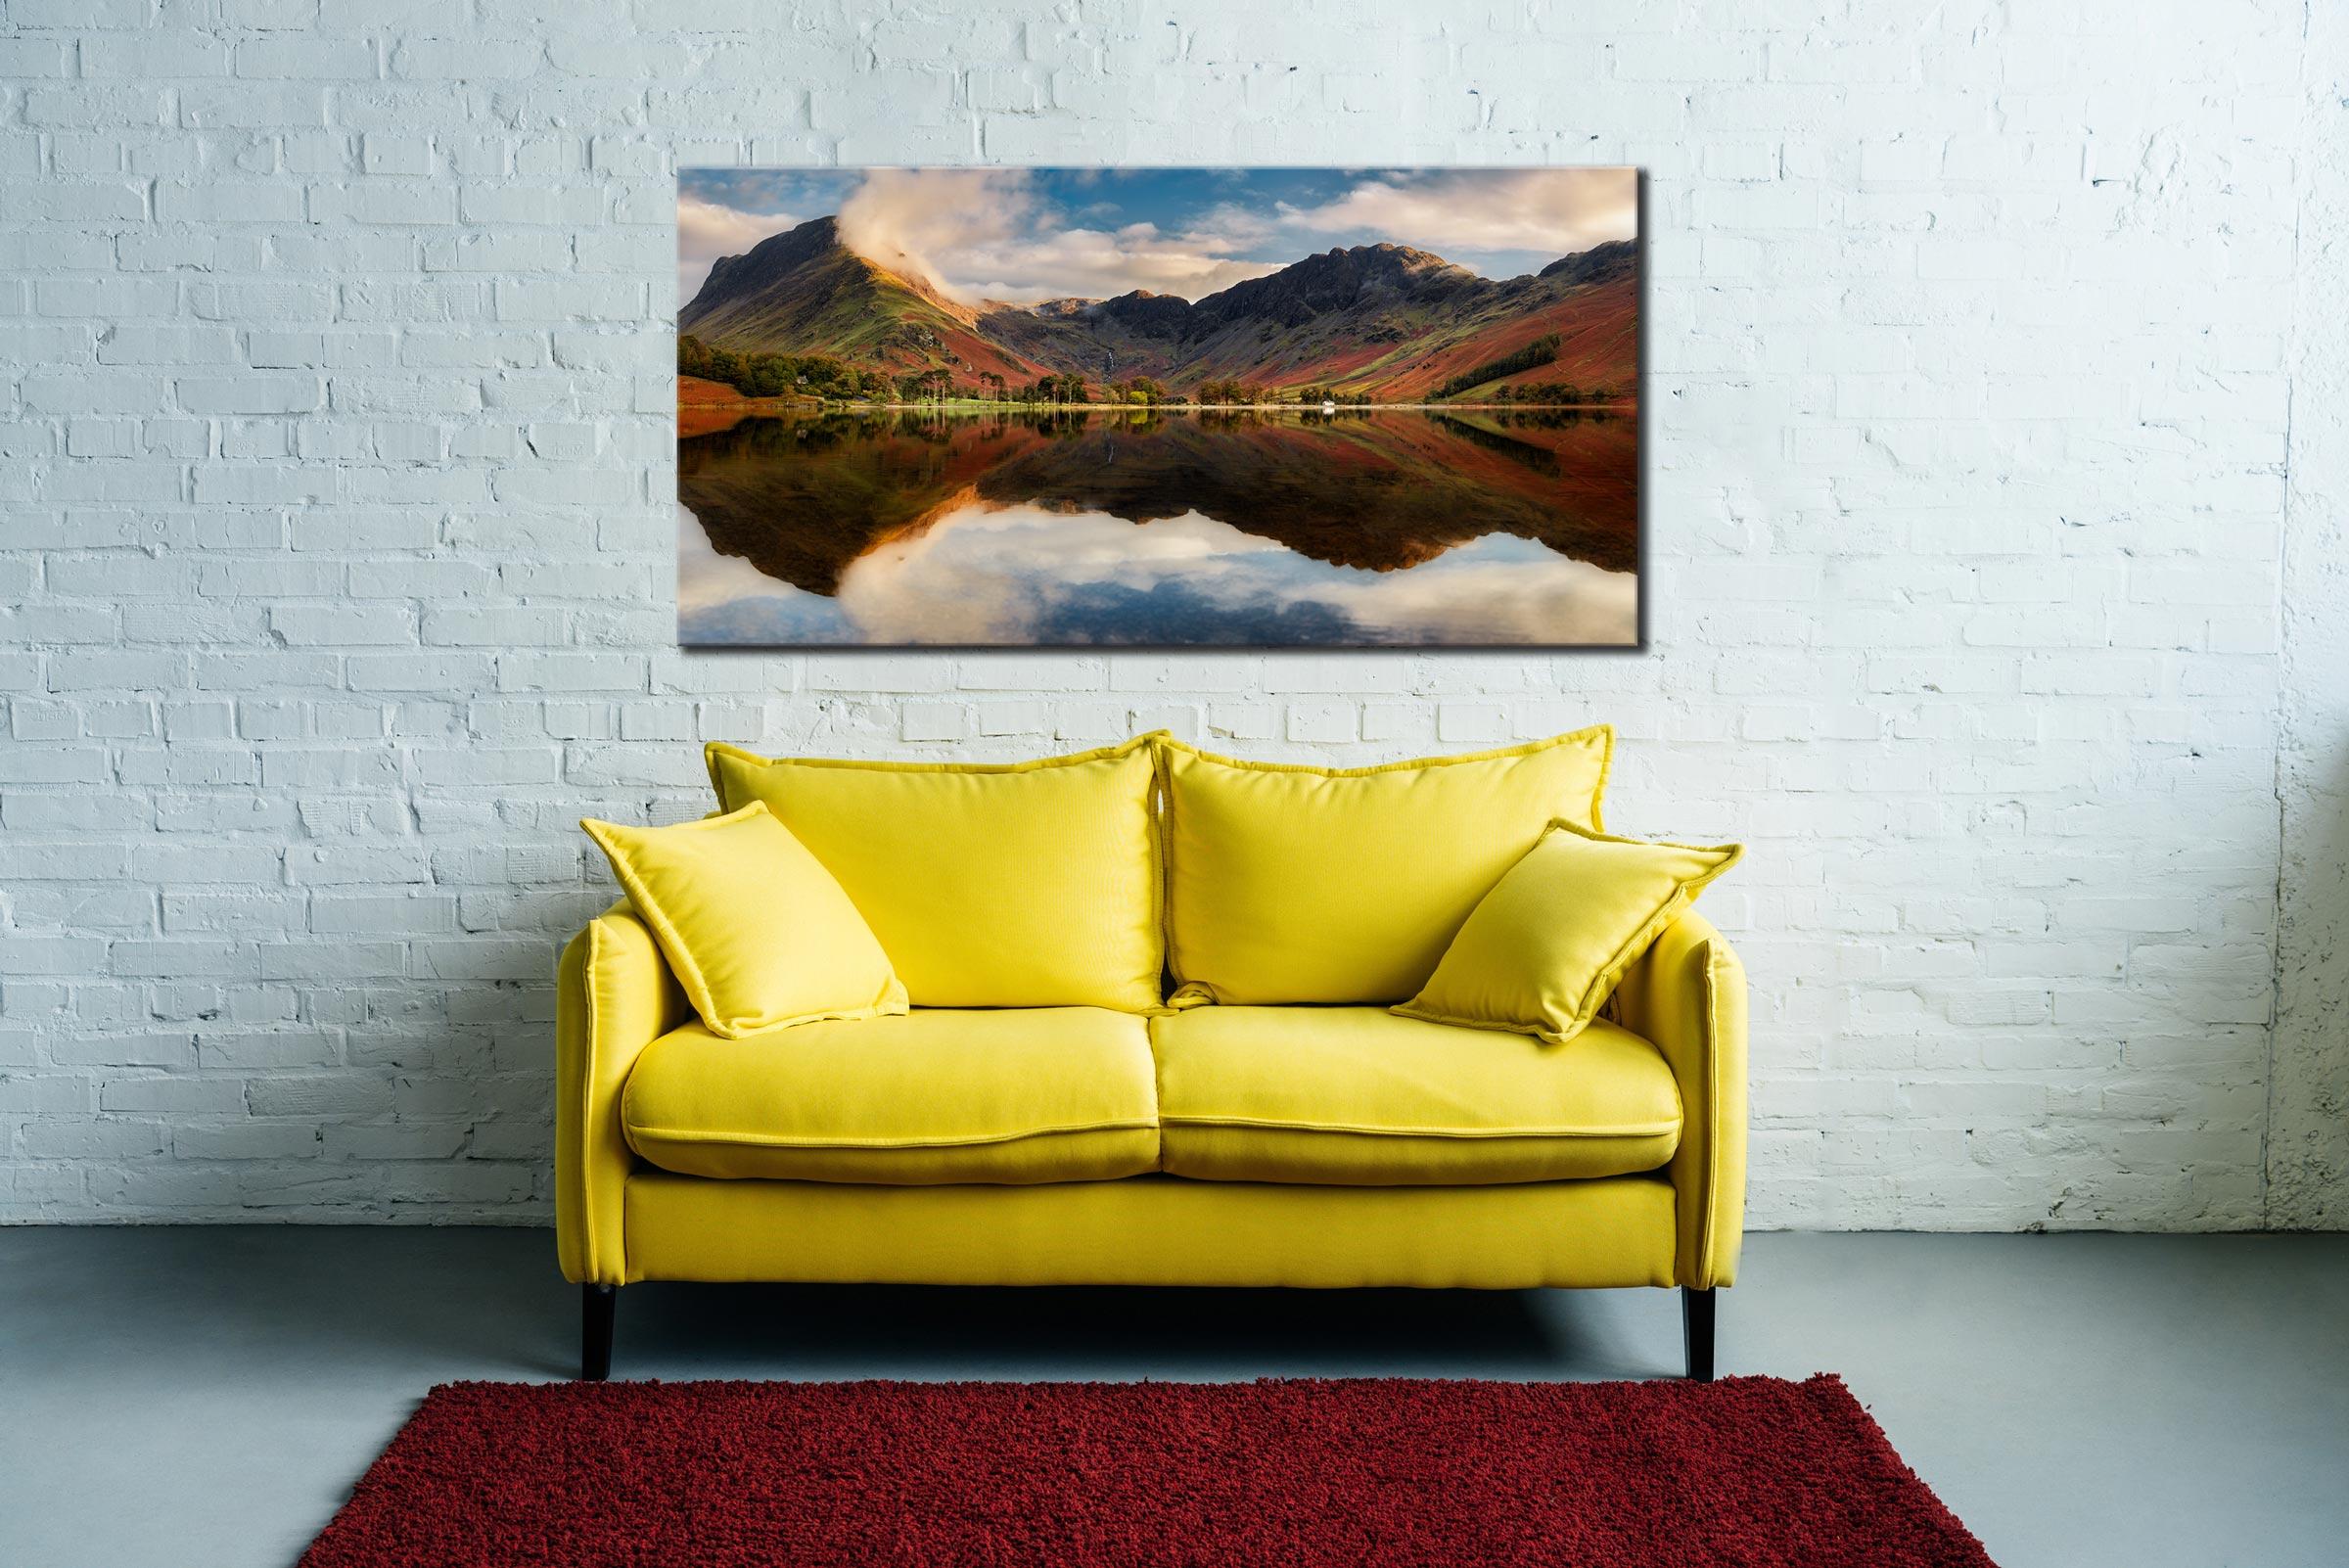 Buttermere Evening Light - Canvas Print on Wall